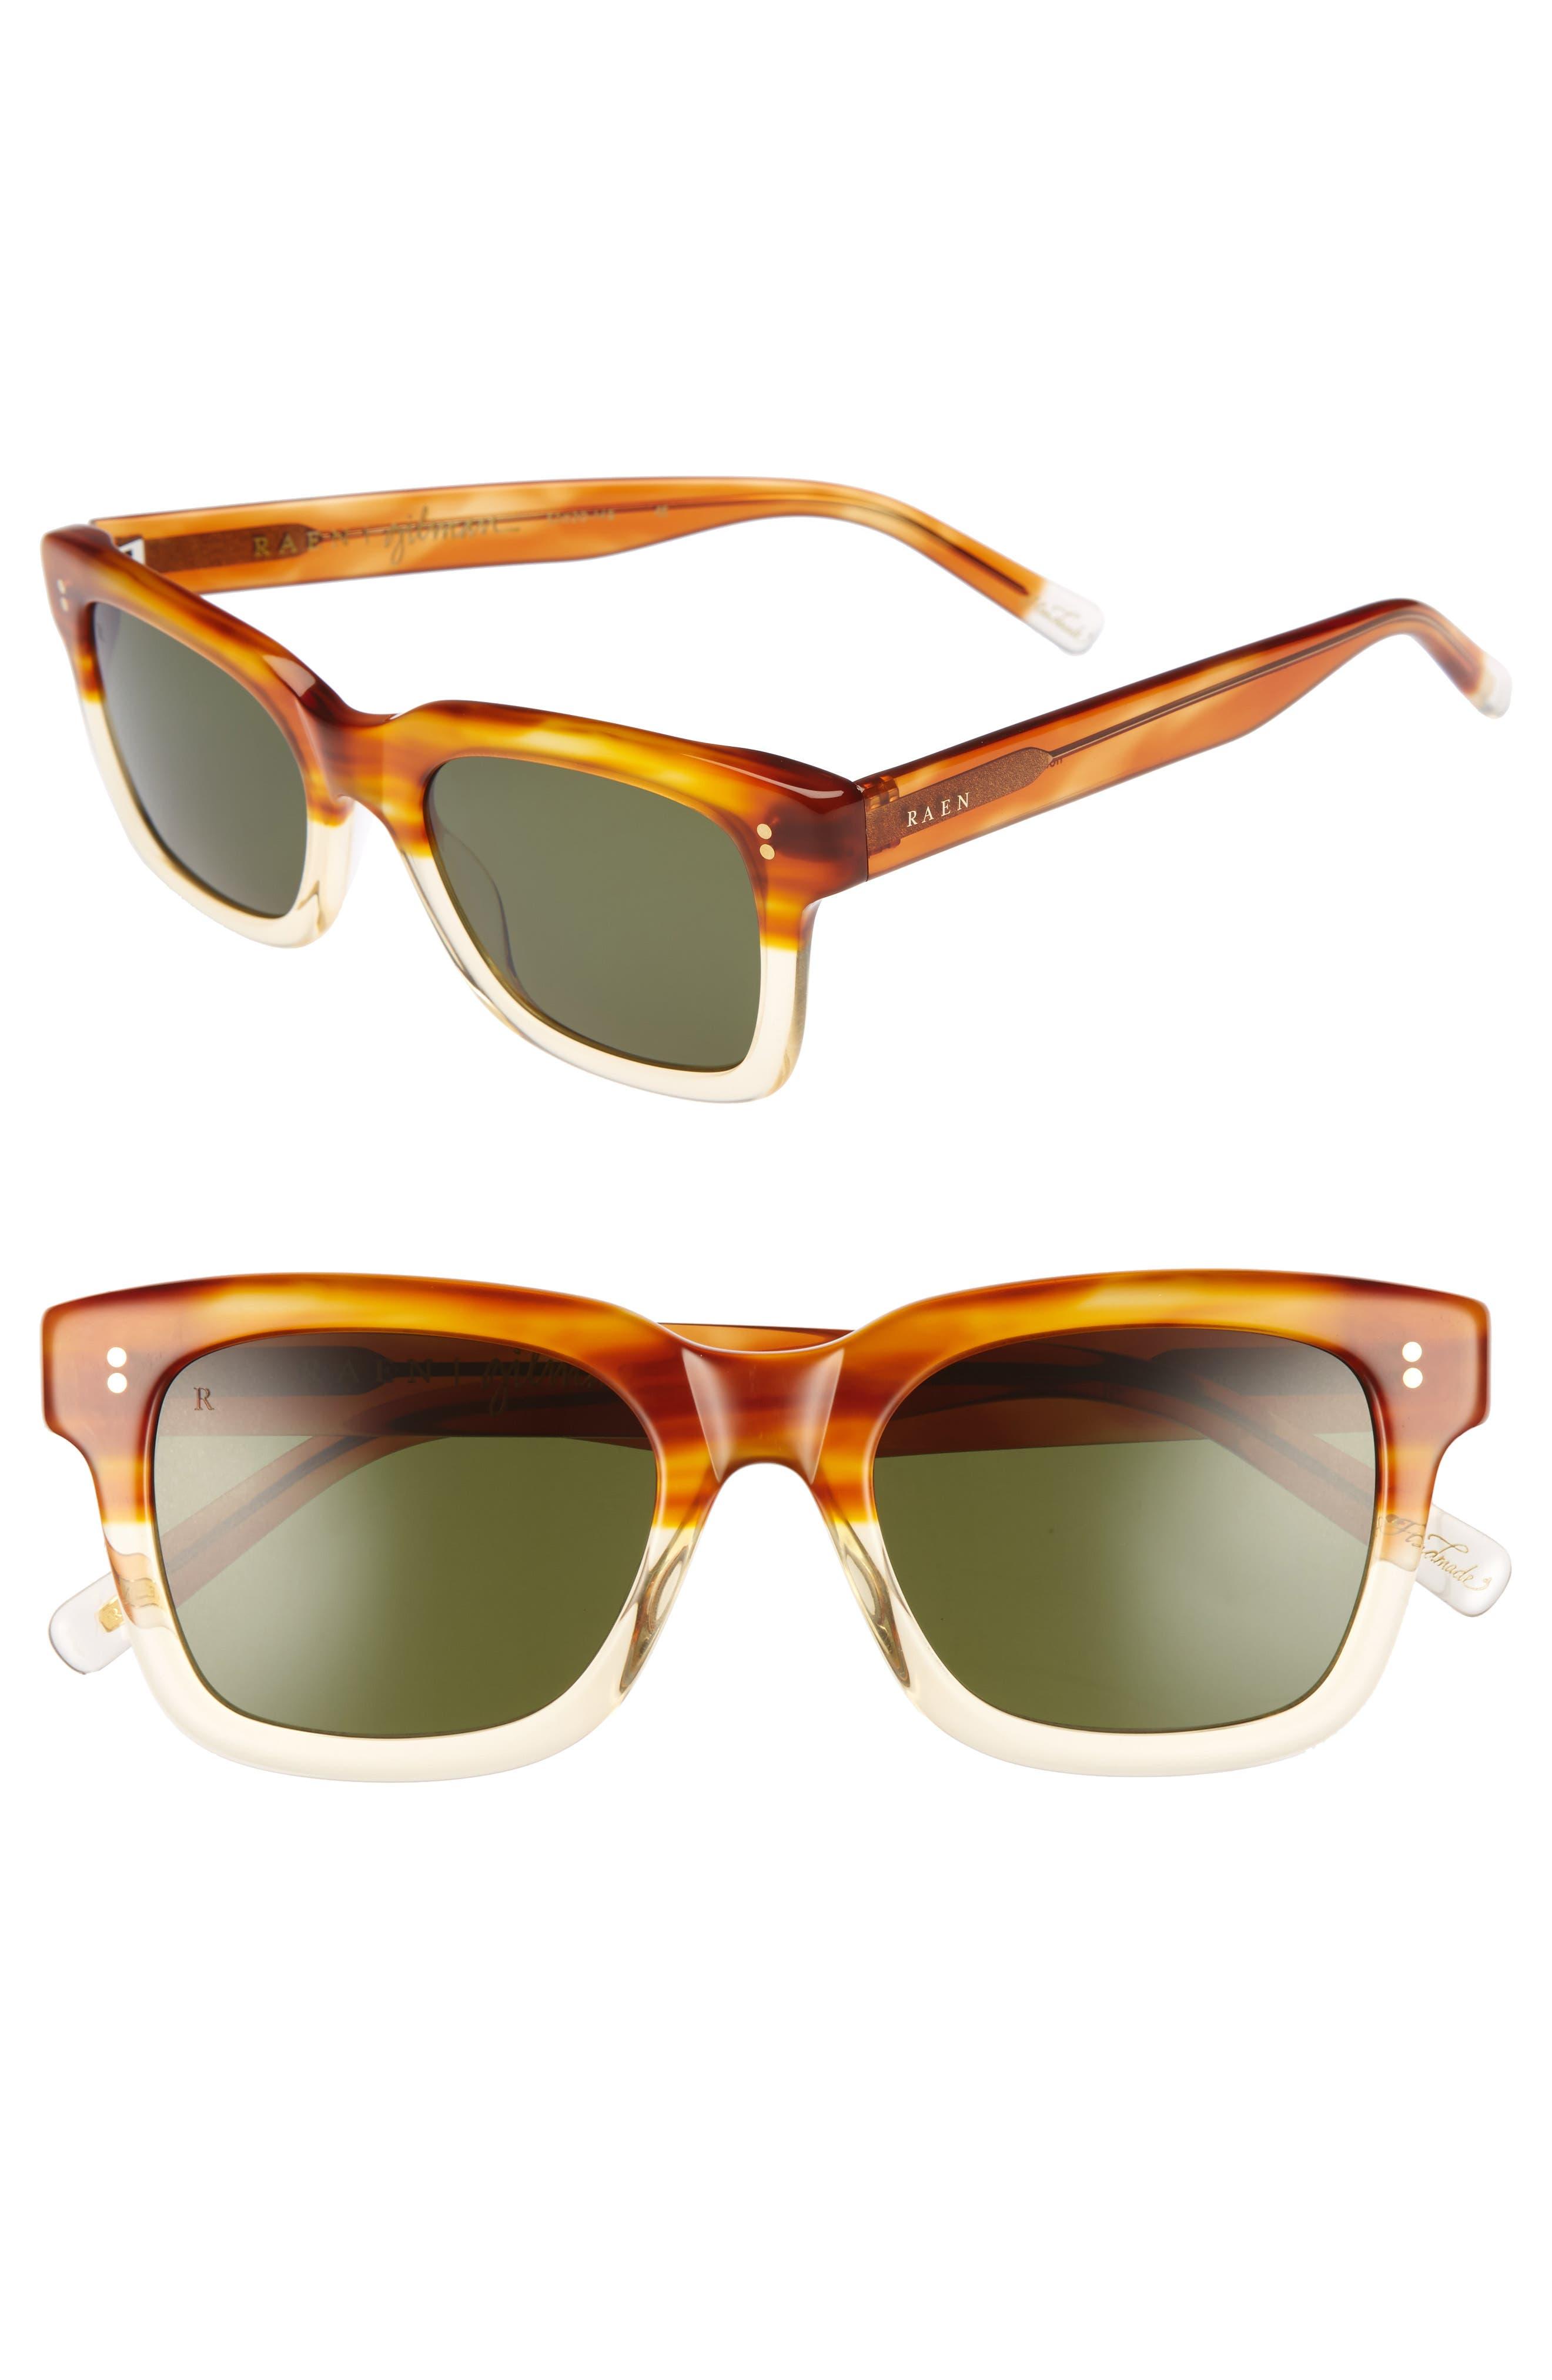 Gilman 52mm Polarized Sunglasses,                             Main thumbnail 1, color,                             Honey Havana/ Green